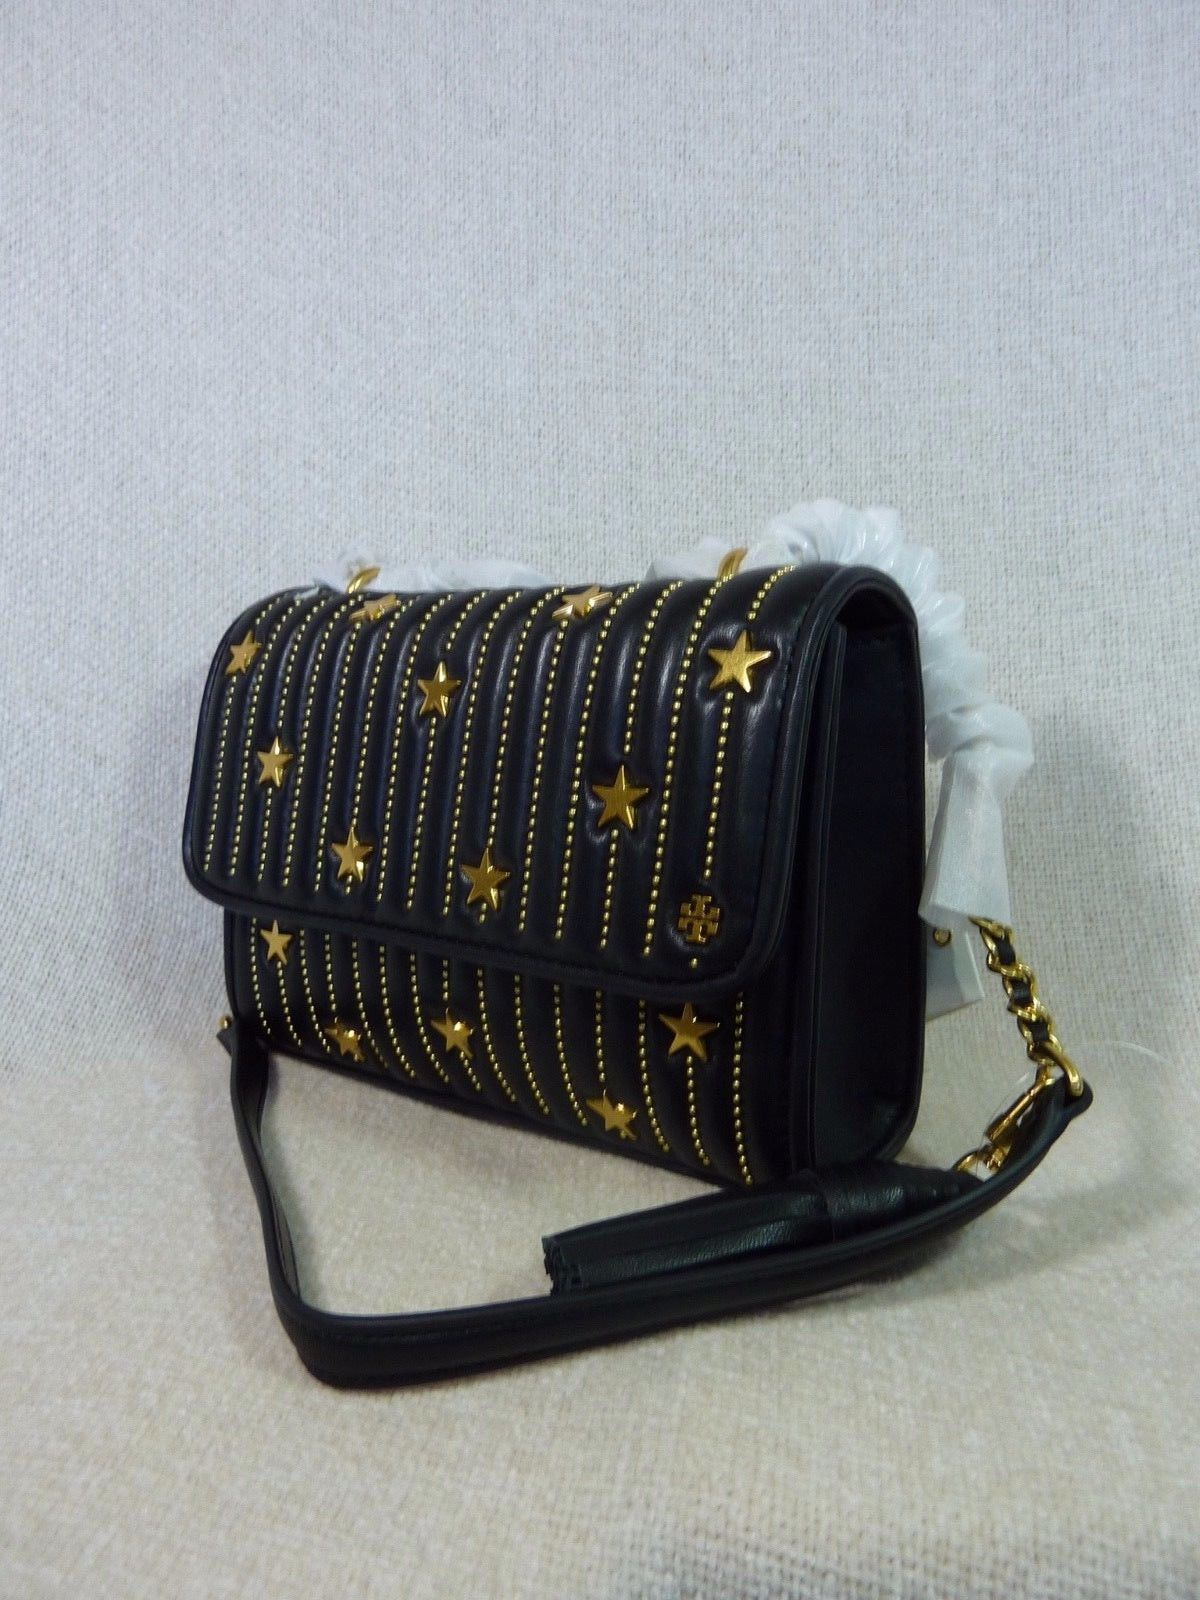 NWT Tory Burch Black Fleming Star-Stud Small Convertible Bag $558 image 2